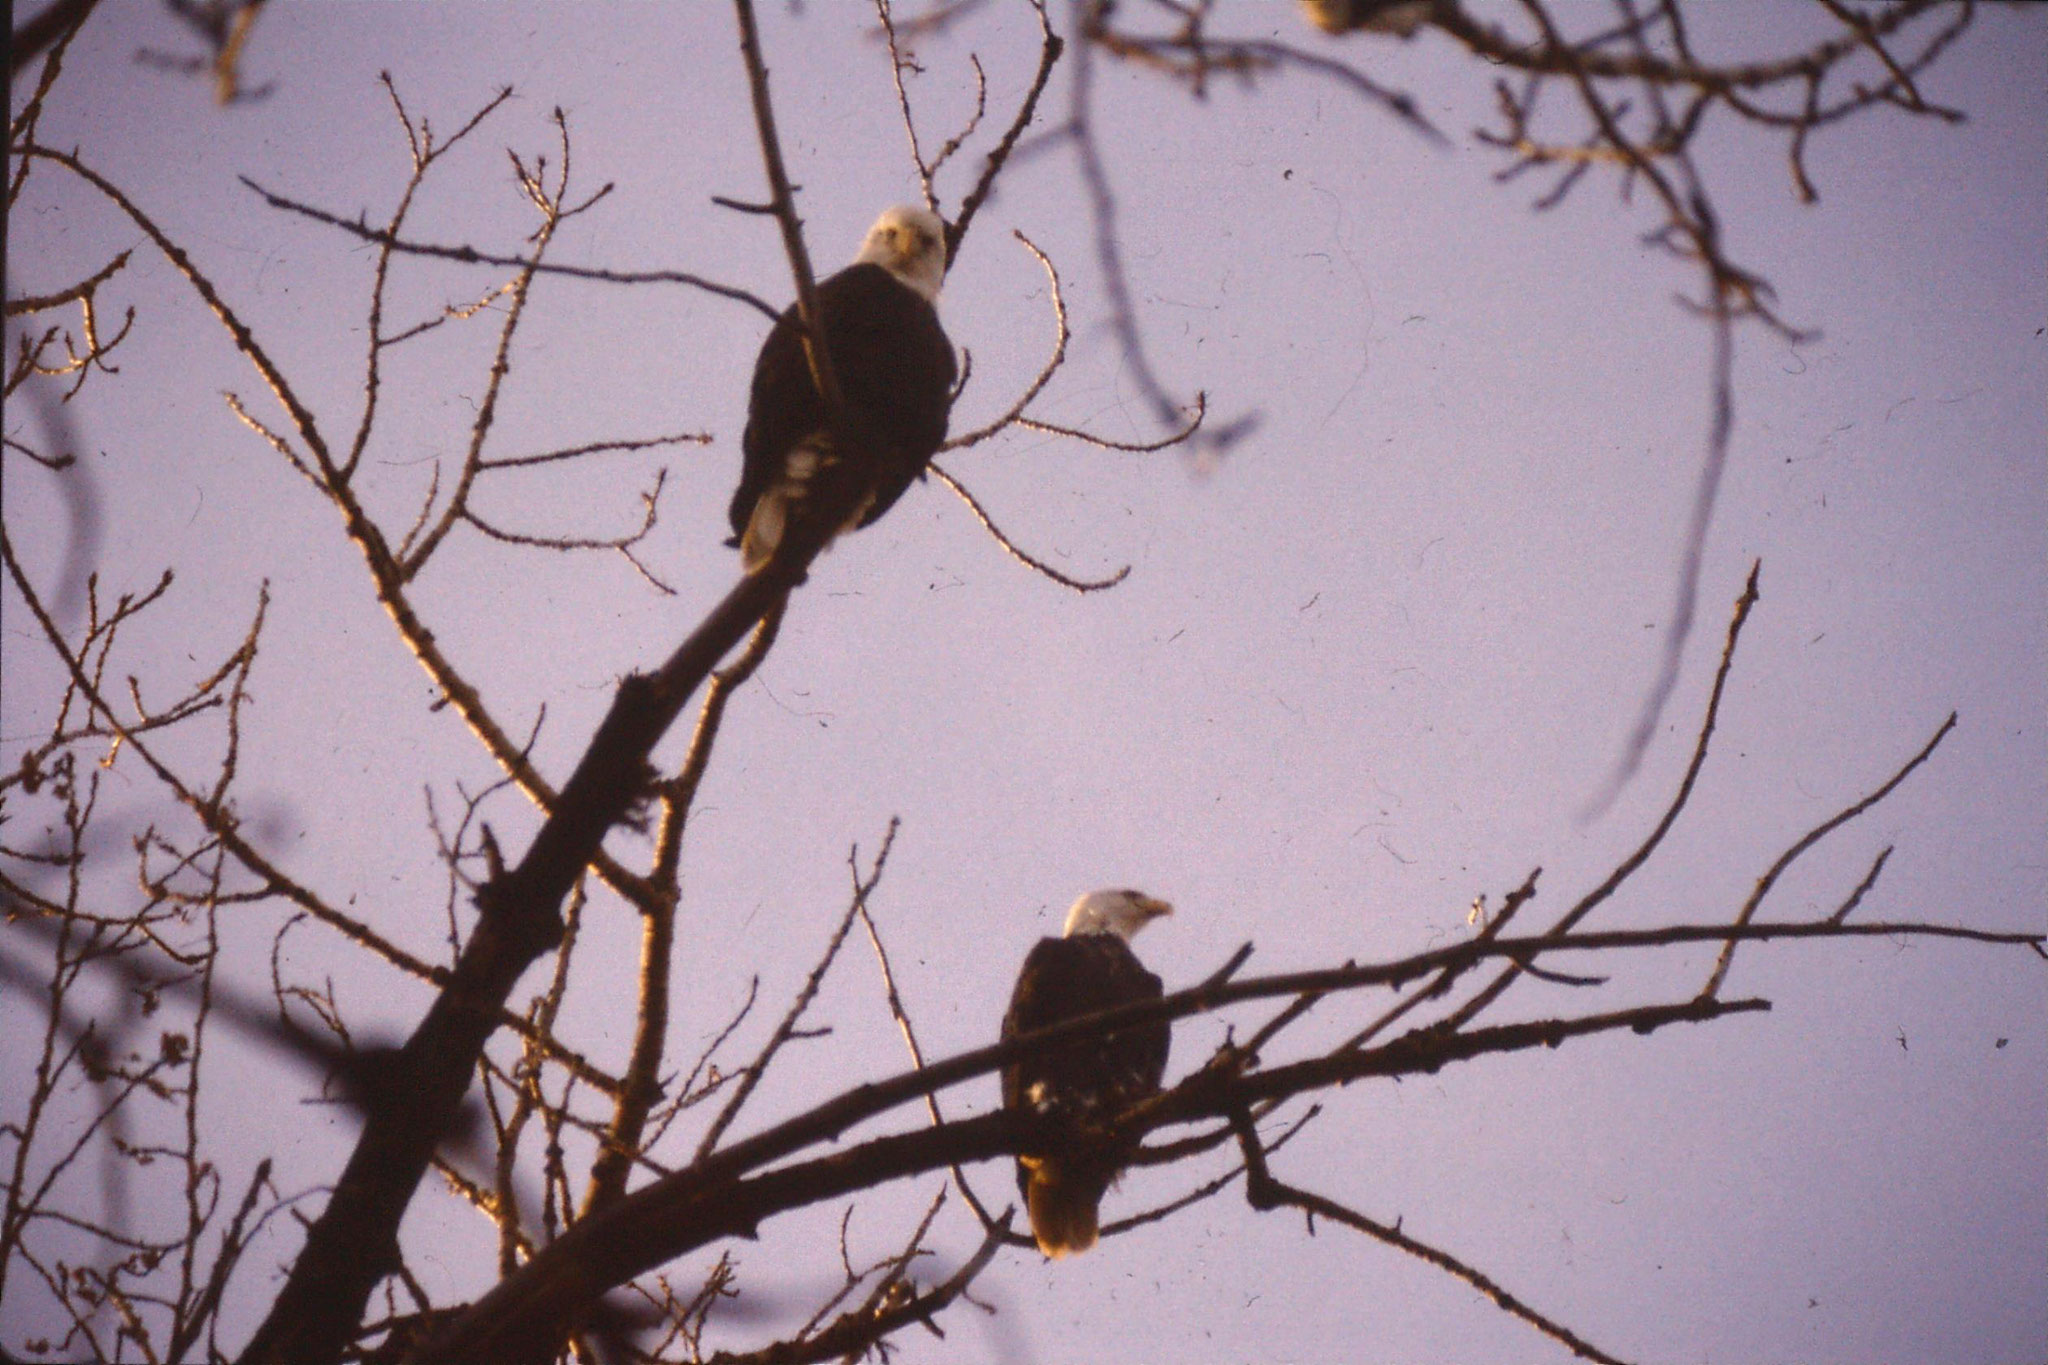 25/1/1991: 1: Boise